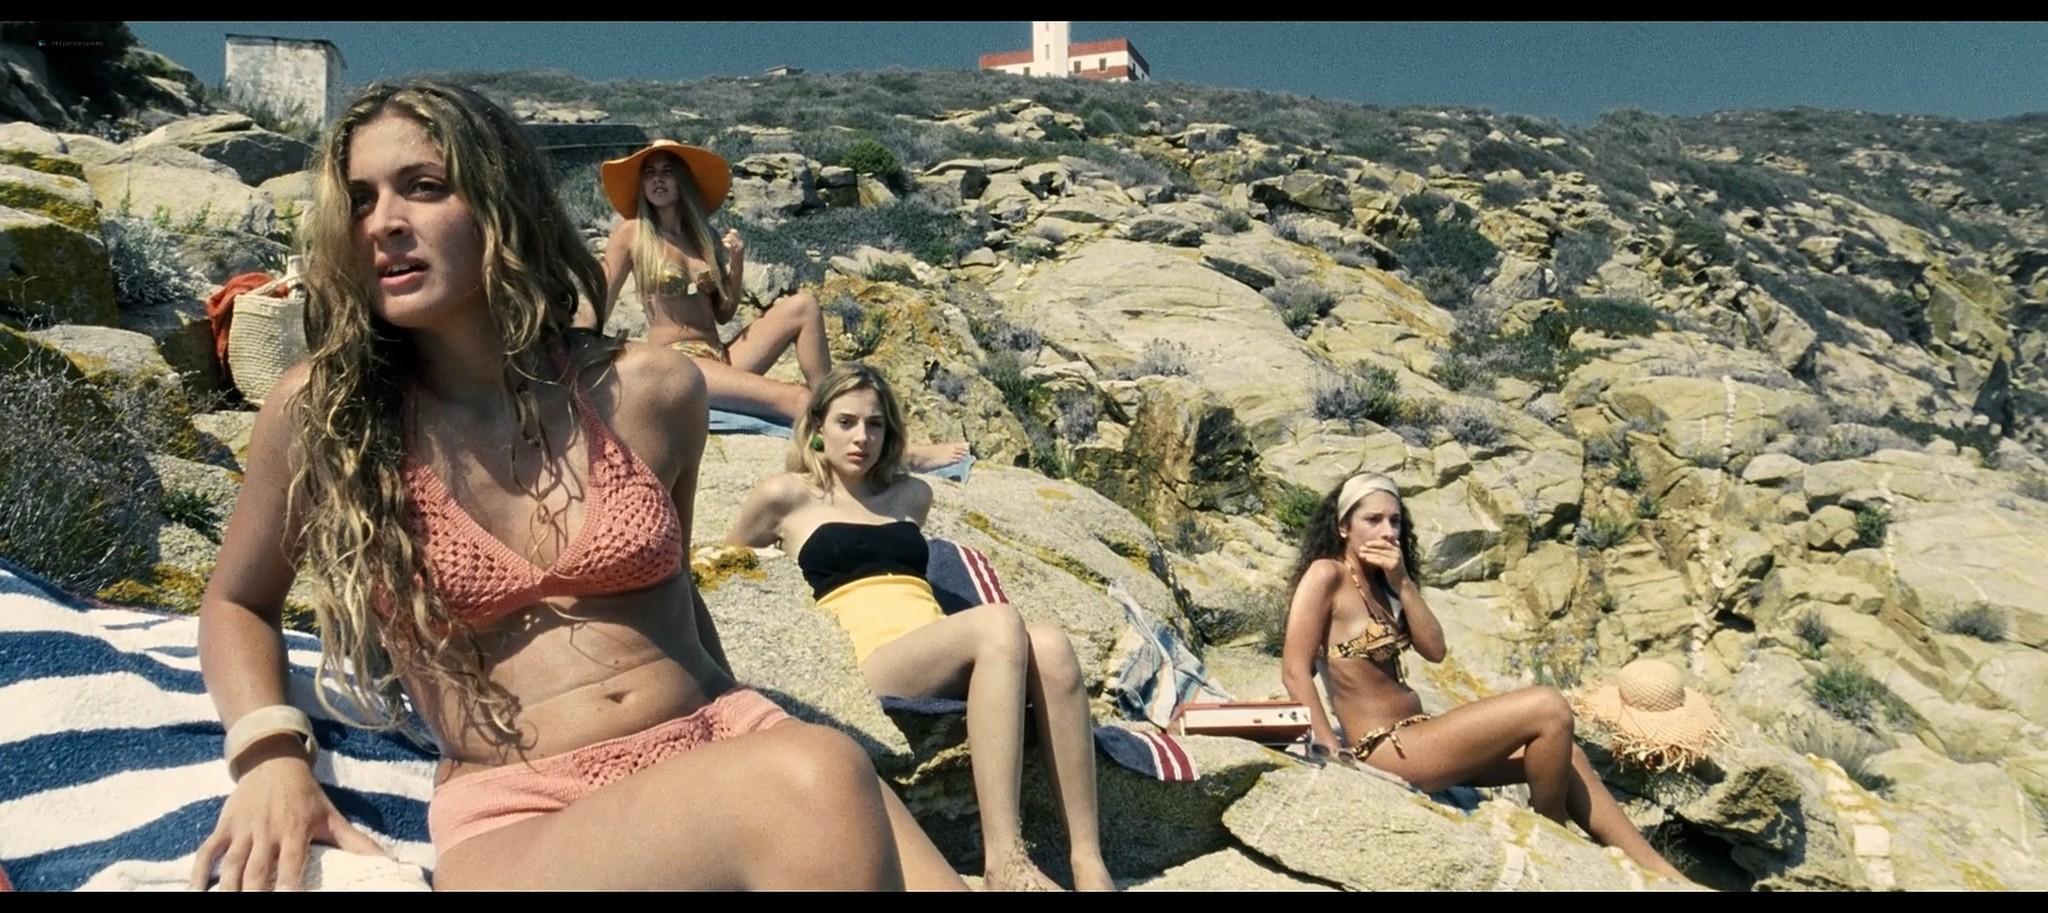 Sabrina Ferilli nude Anita Kravos full frontal Galatea Ranzi and others nude and sexy The Great Beauty IT 2013 1080p BluRey 8